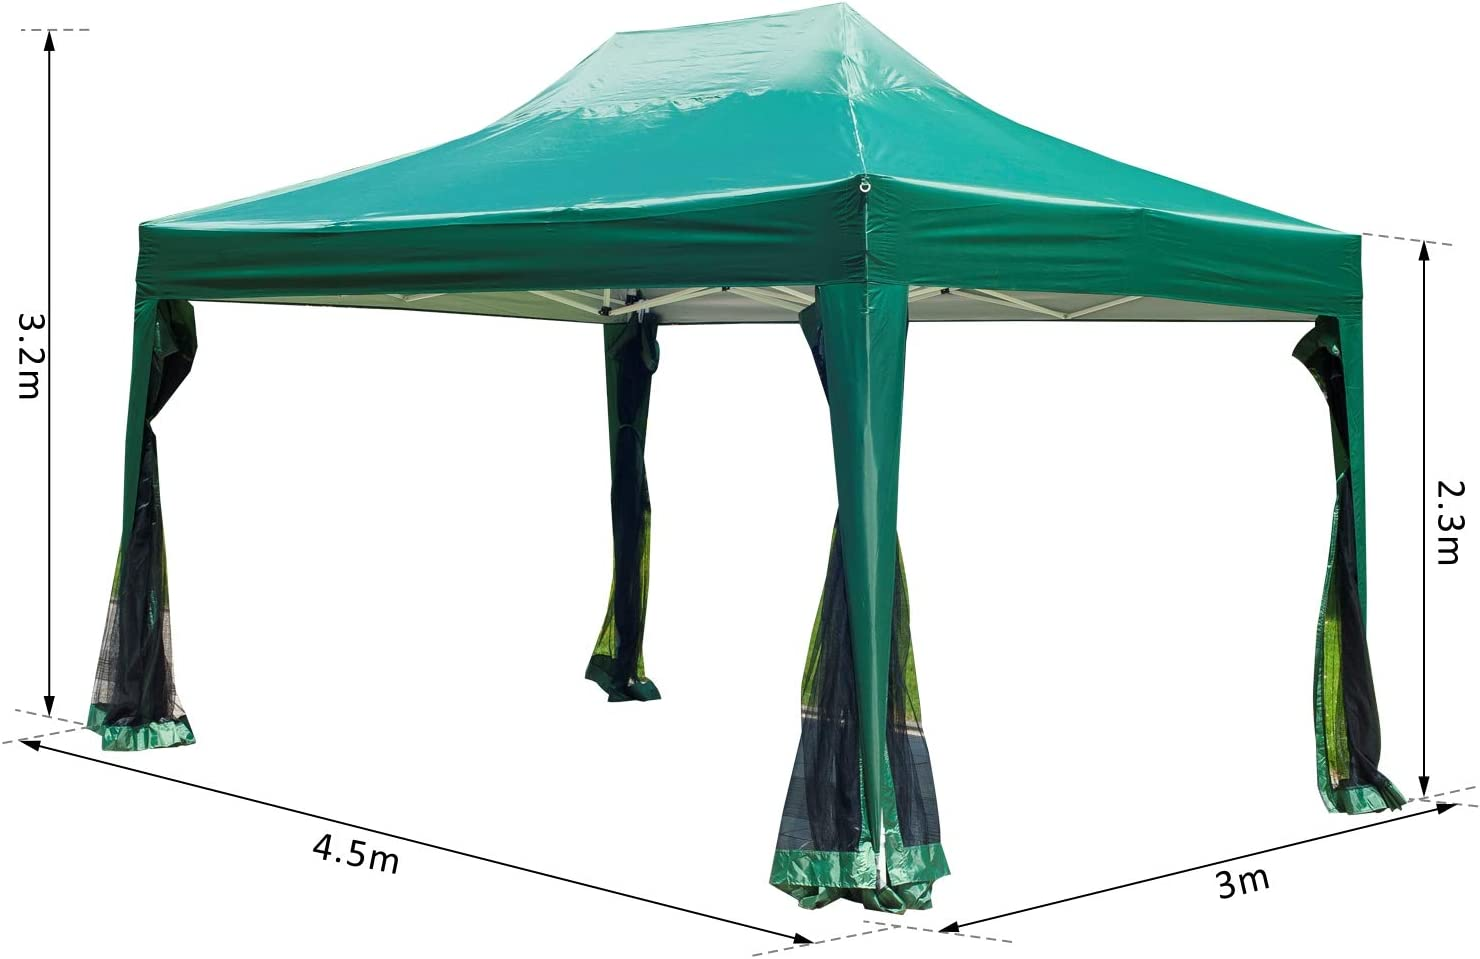 Outsunny Carpa 3x4.5m + Mosquitera Carpa Plegable en Acordeon Gazebo Verde terraza Jardin: Amazon.es: Jardín